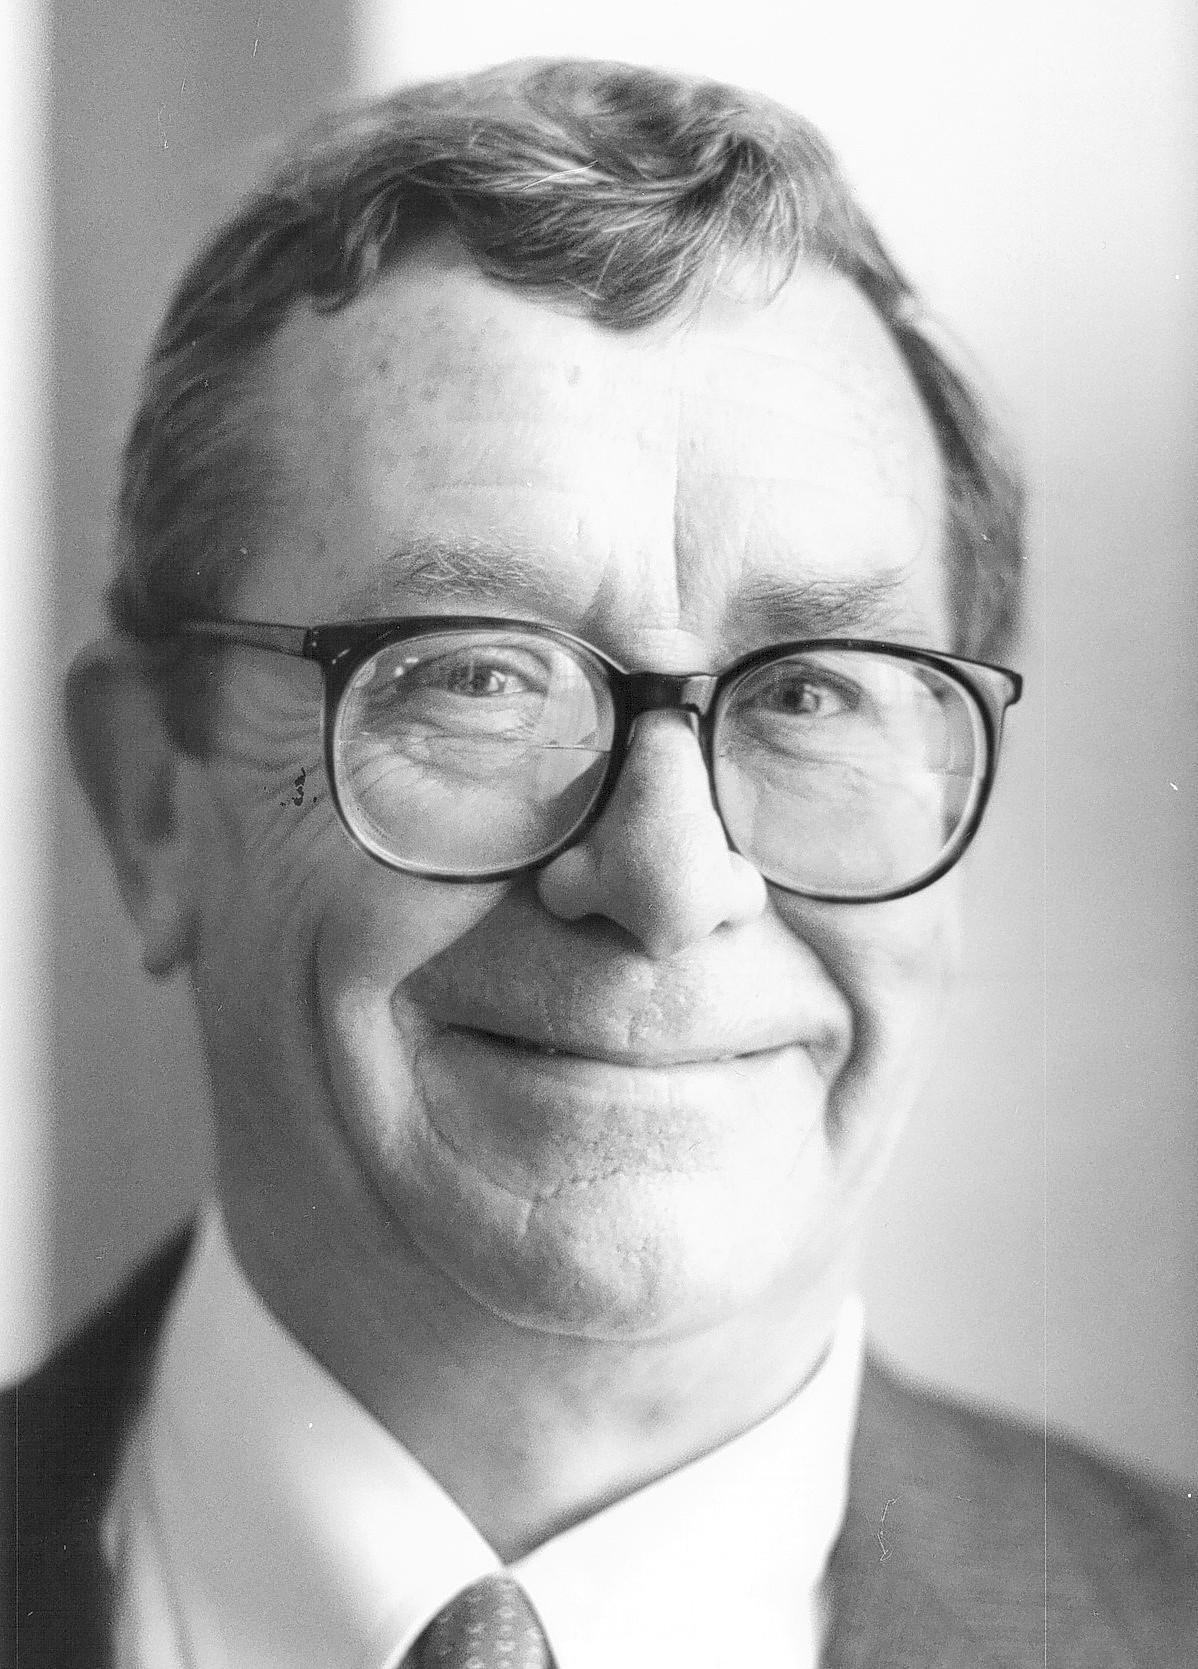 Judge Robert L. Karwacki, 1990